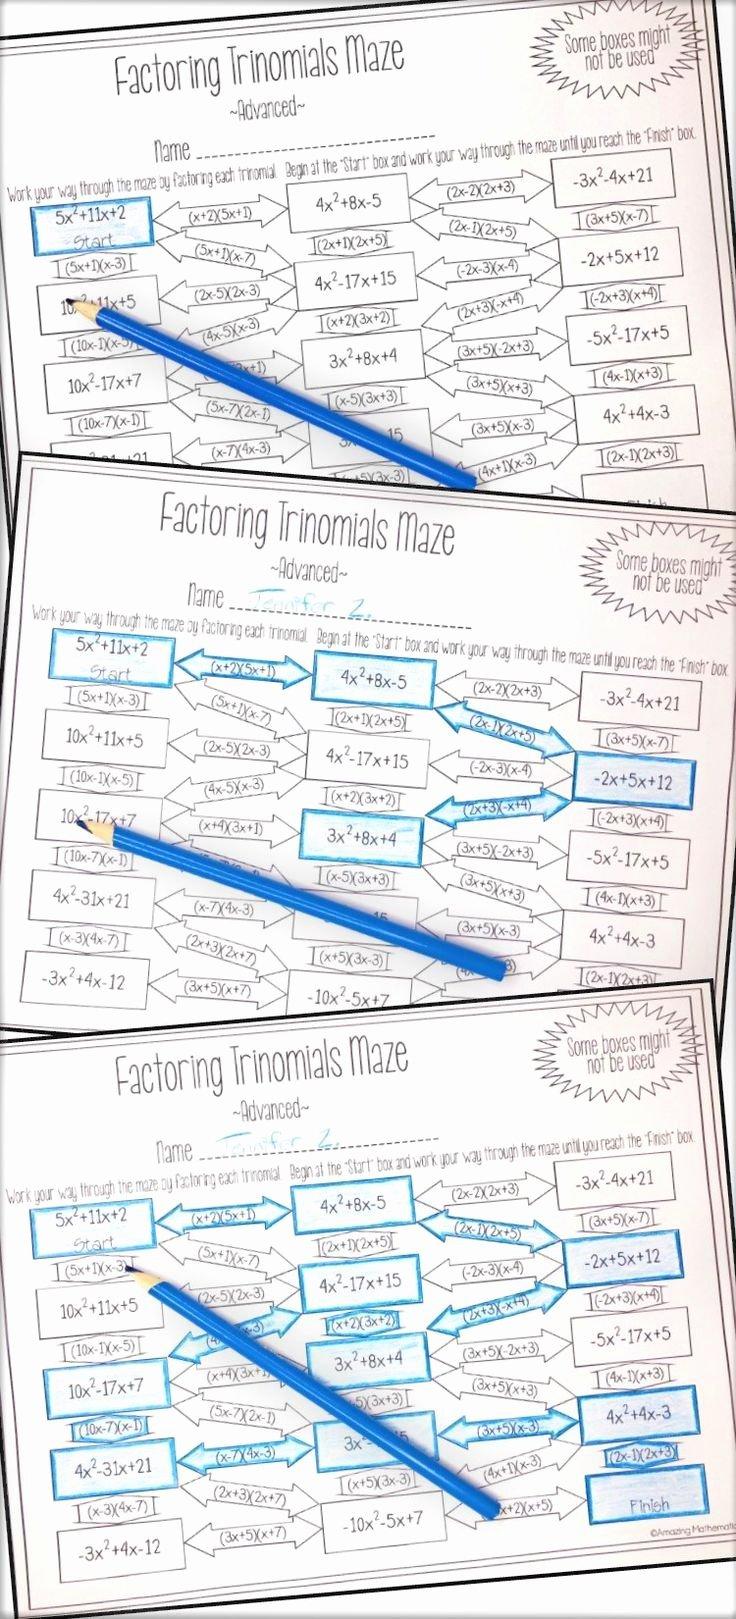 Factoring Worksheet Algebra 1 Lovely Factoring Polynomials Trinomials Maze Advanced